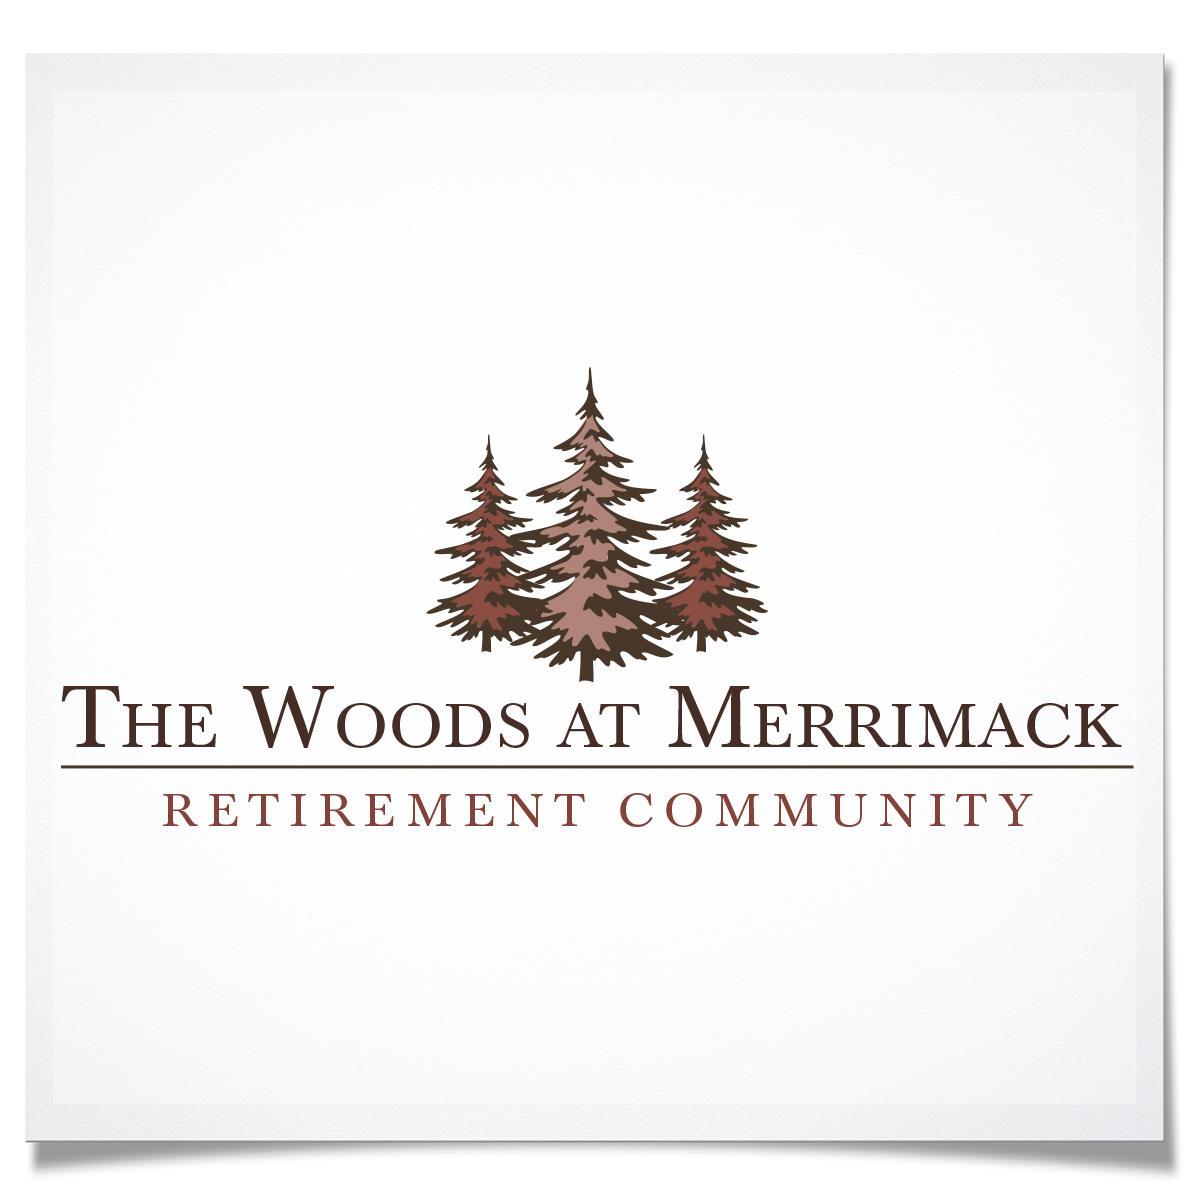 The Woods at Merrimack Retirement Community